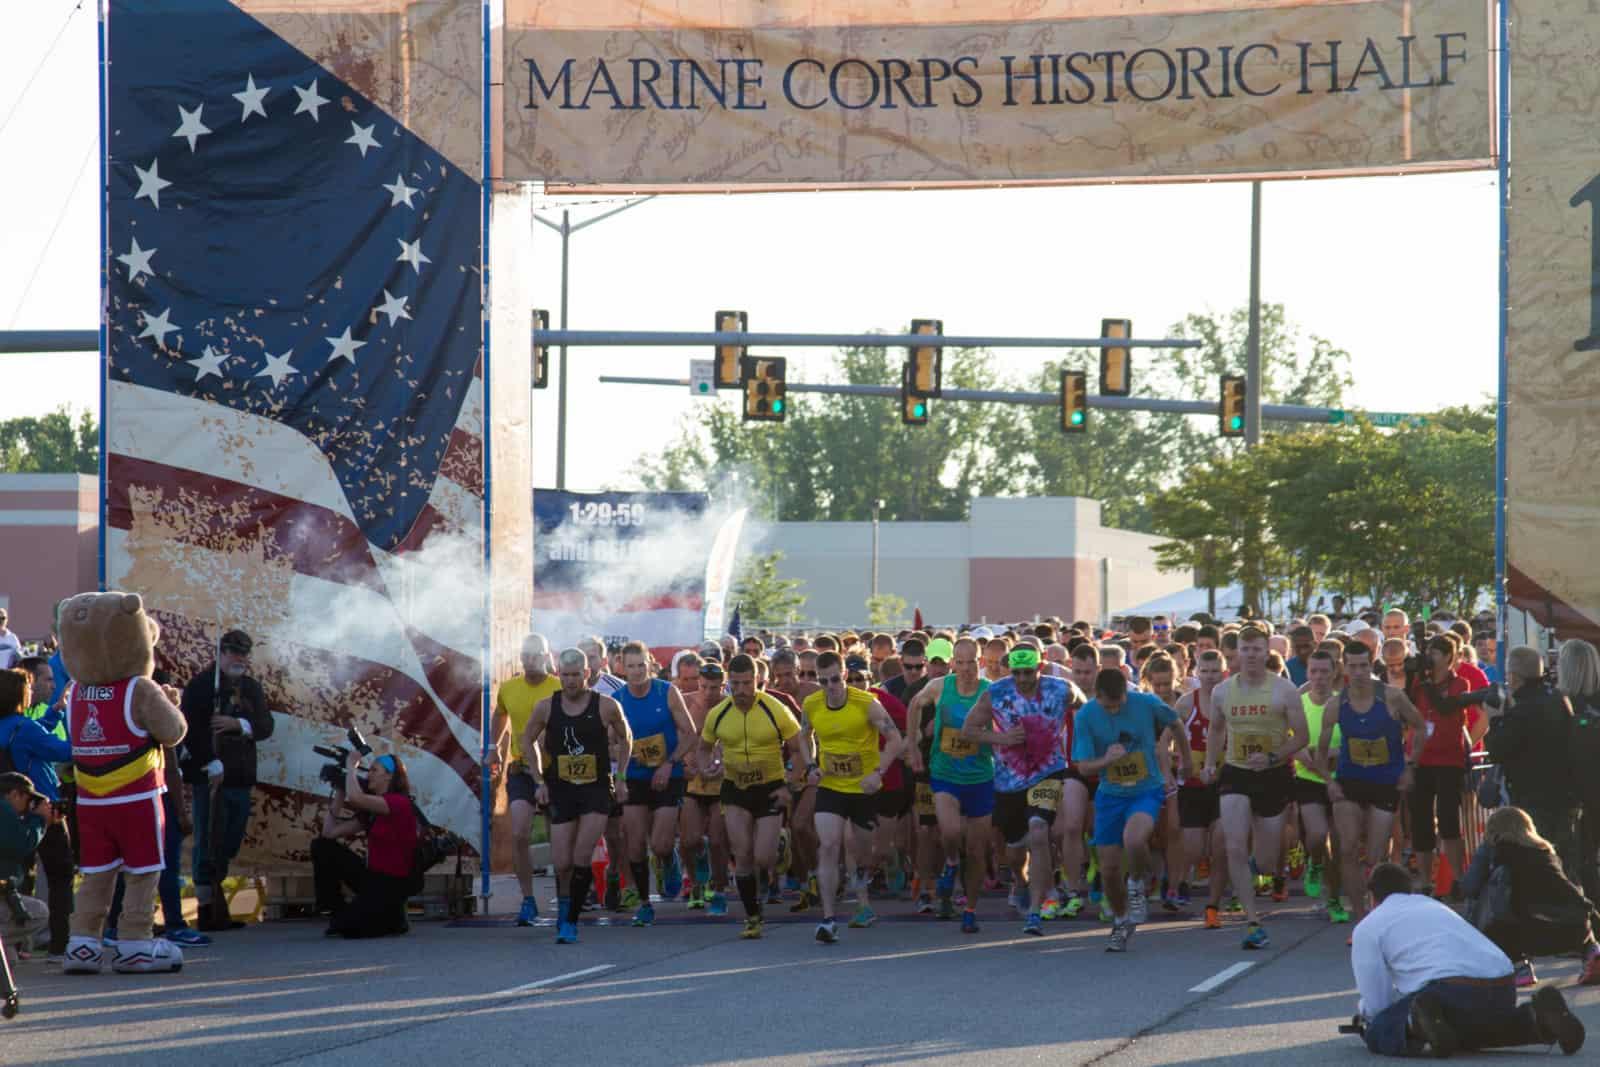 marine corps marathon greatest half in history 2018 sun 20 may